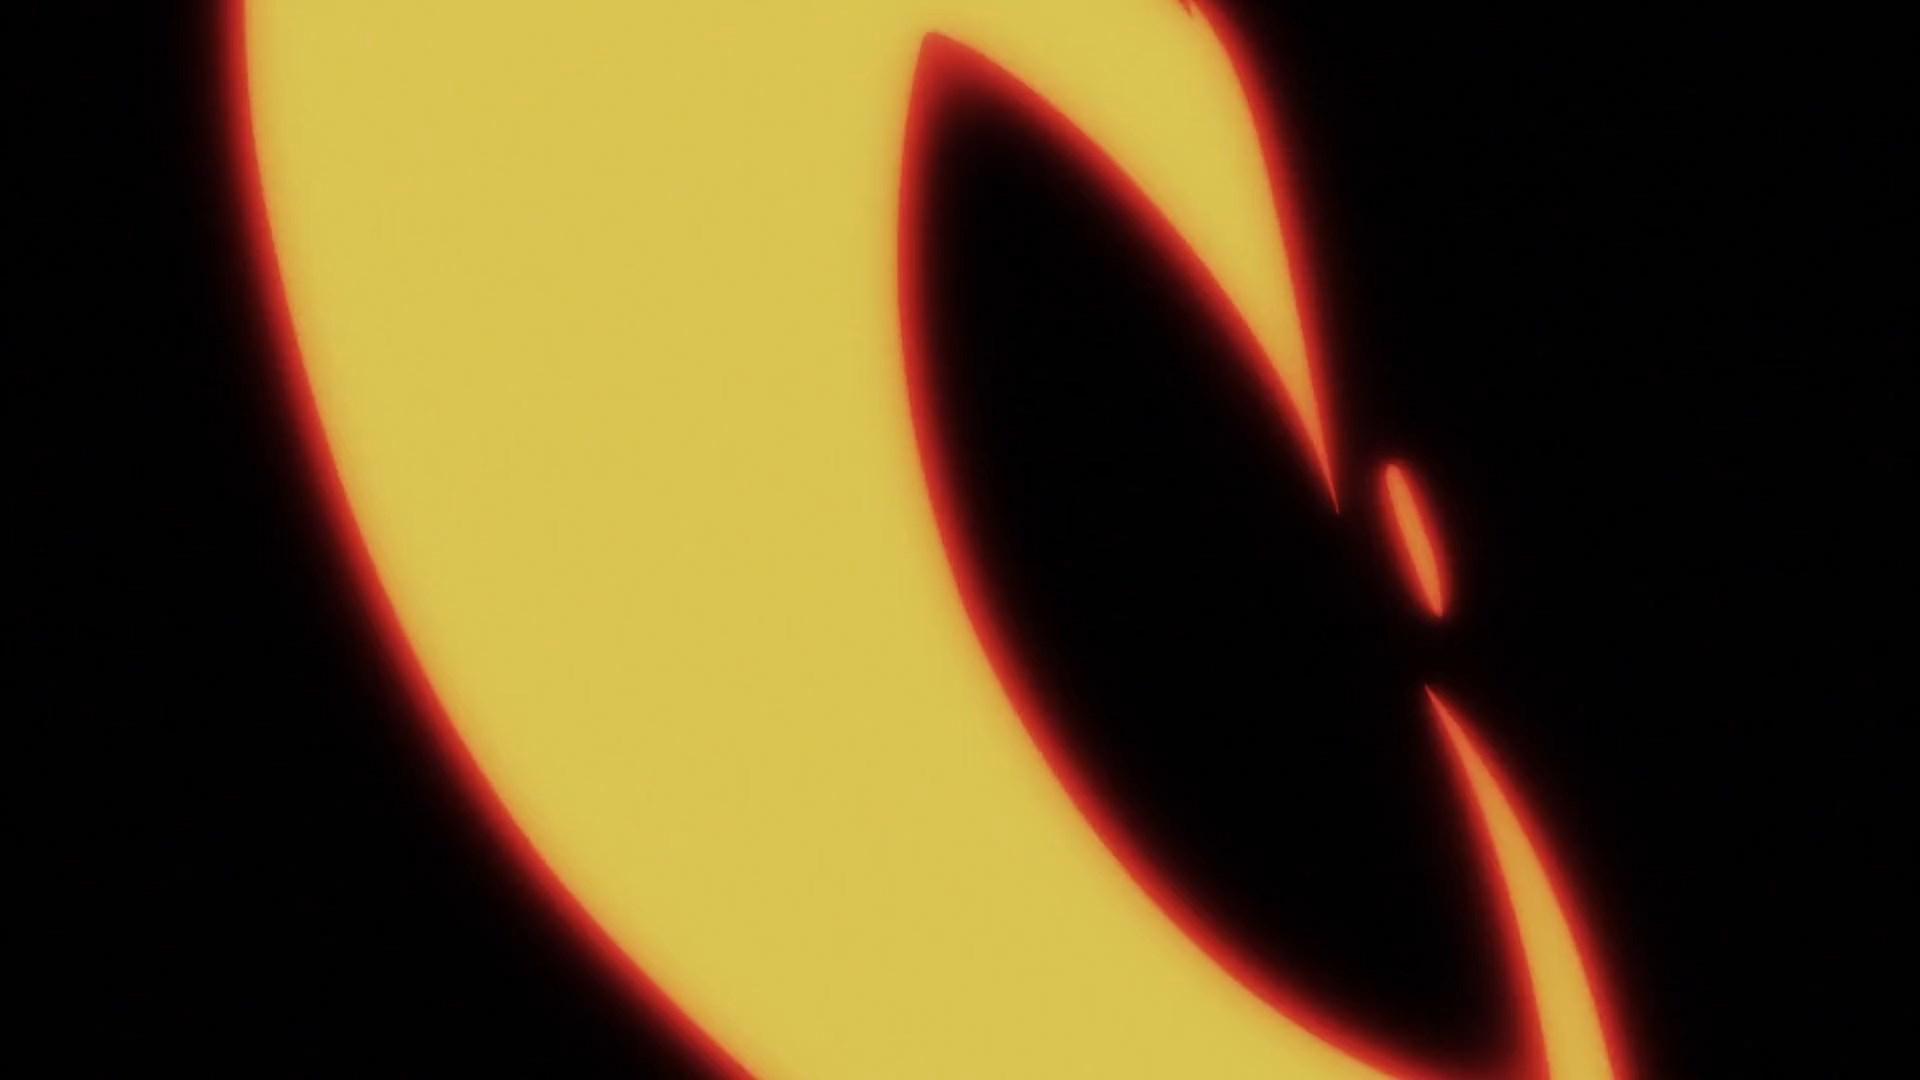 [HorribleSubs] Dragon Ball Super - 121 [1080p].mkv_snapshot_06.57